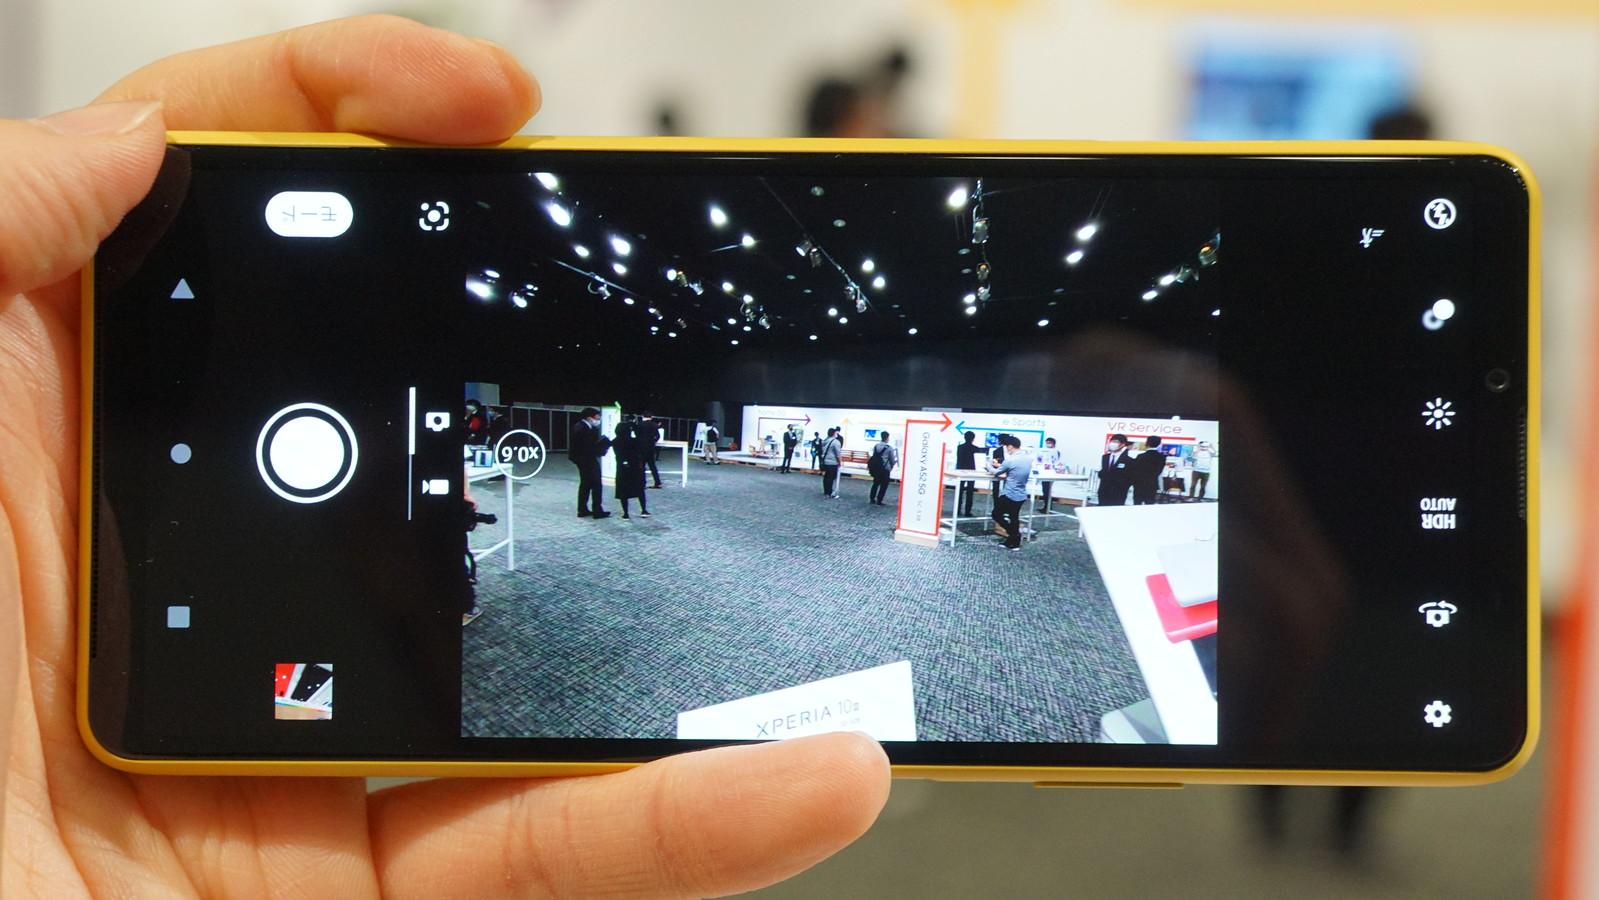 Xperia 10 IIIのカメラ。超広角レンズの0.6倍で撮影